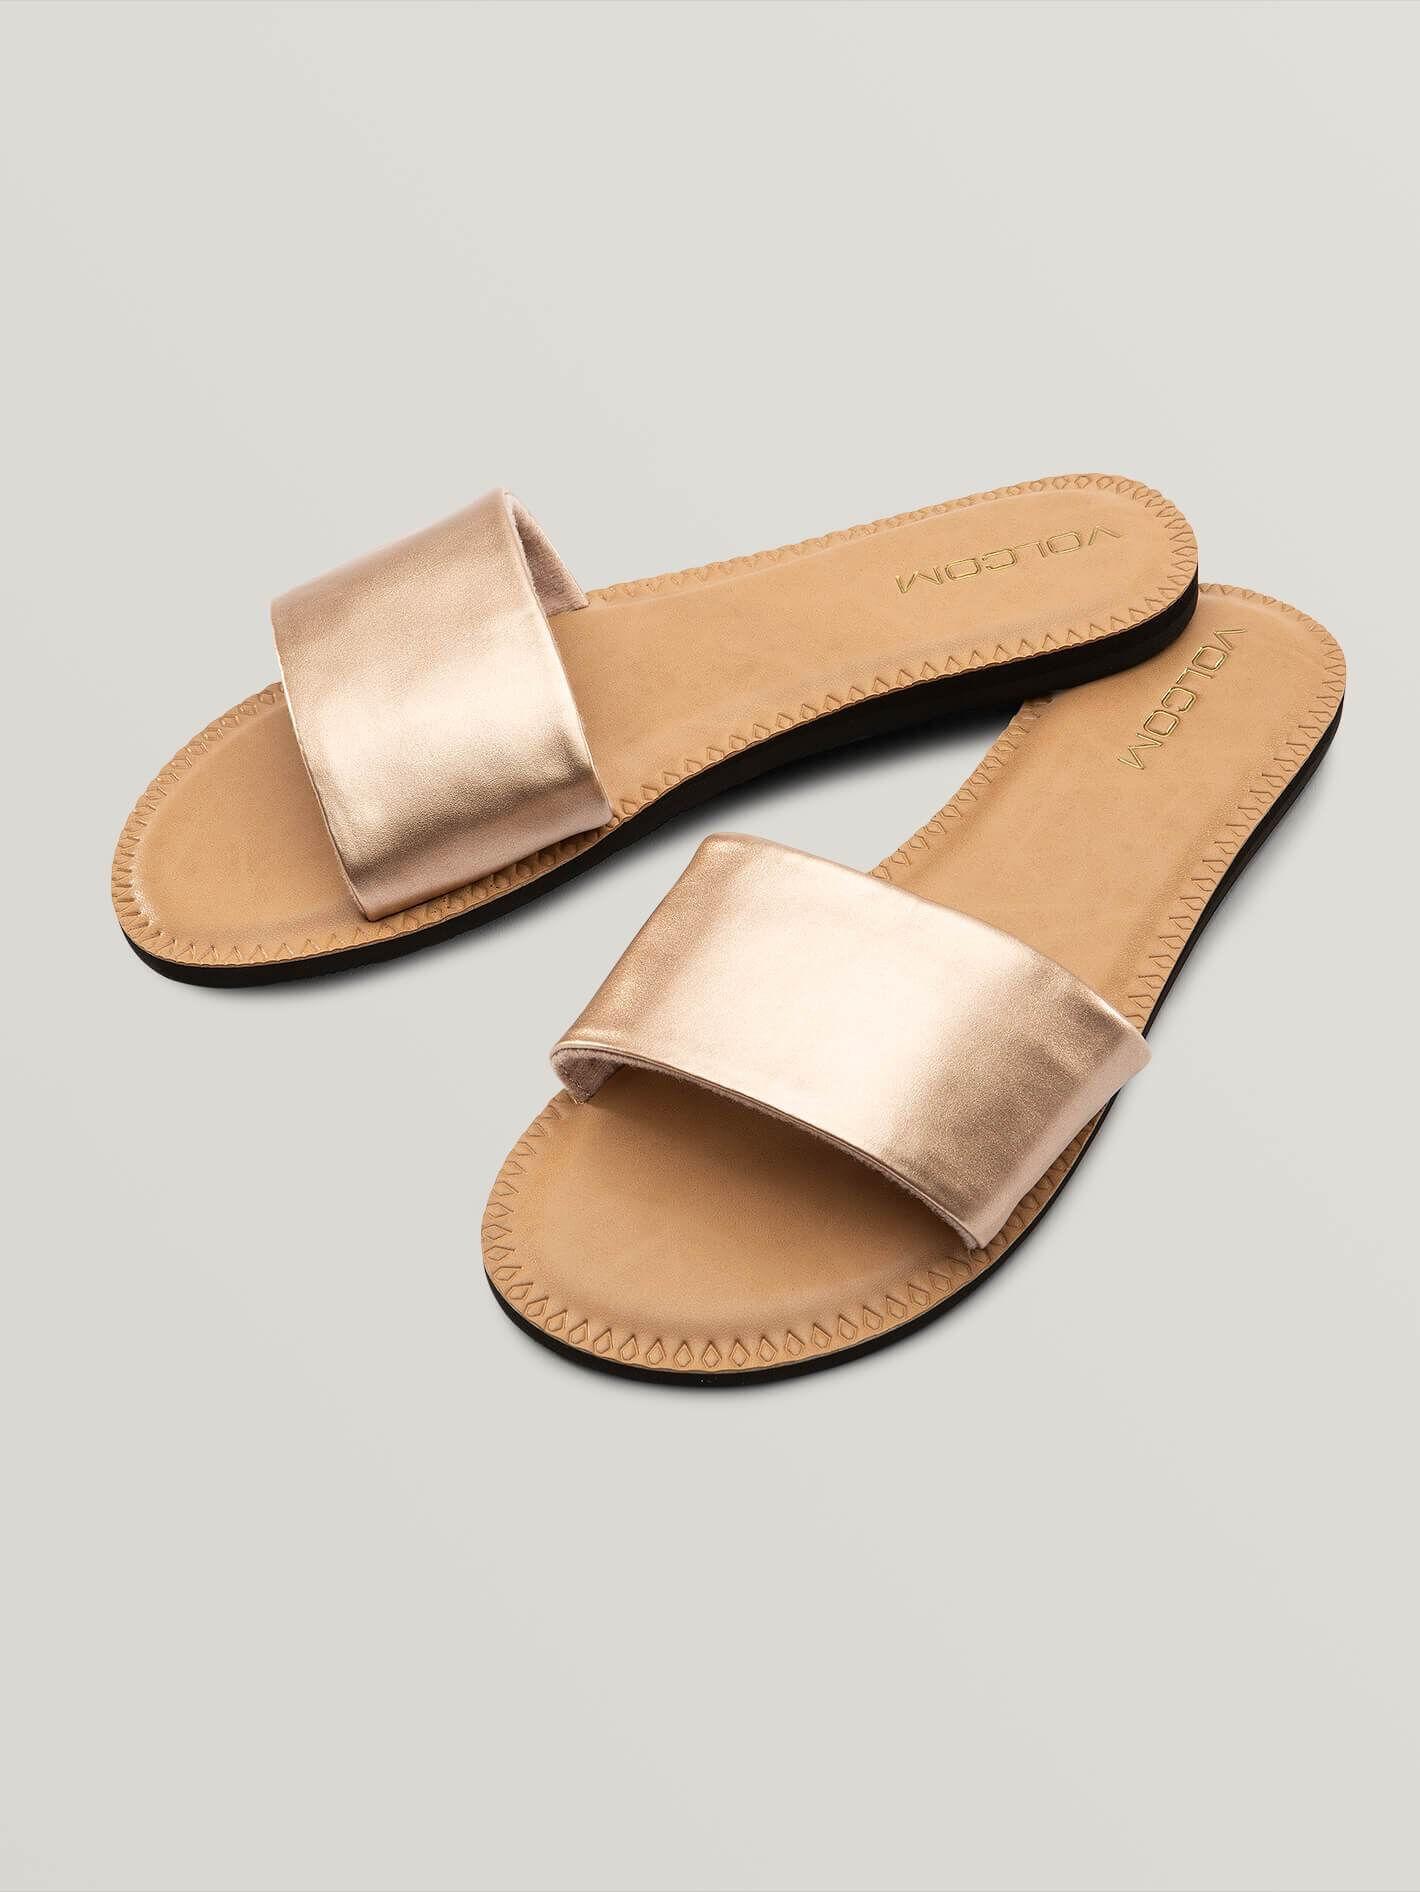 volcom Sandales Volcom Simple Slide Rose Gold Femme